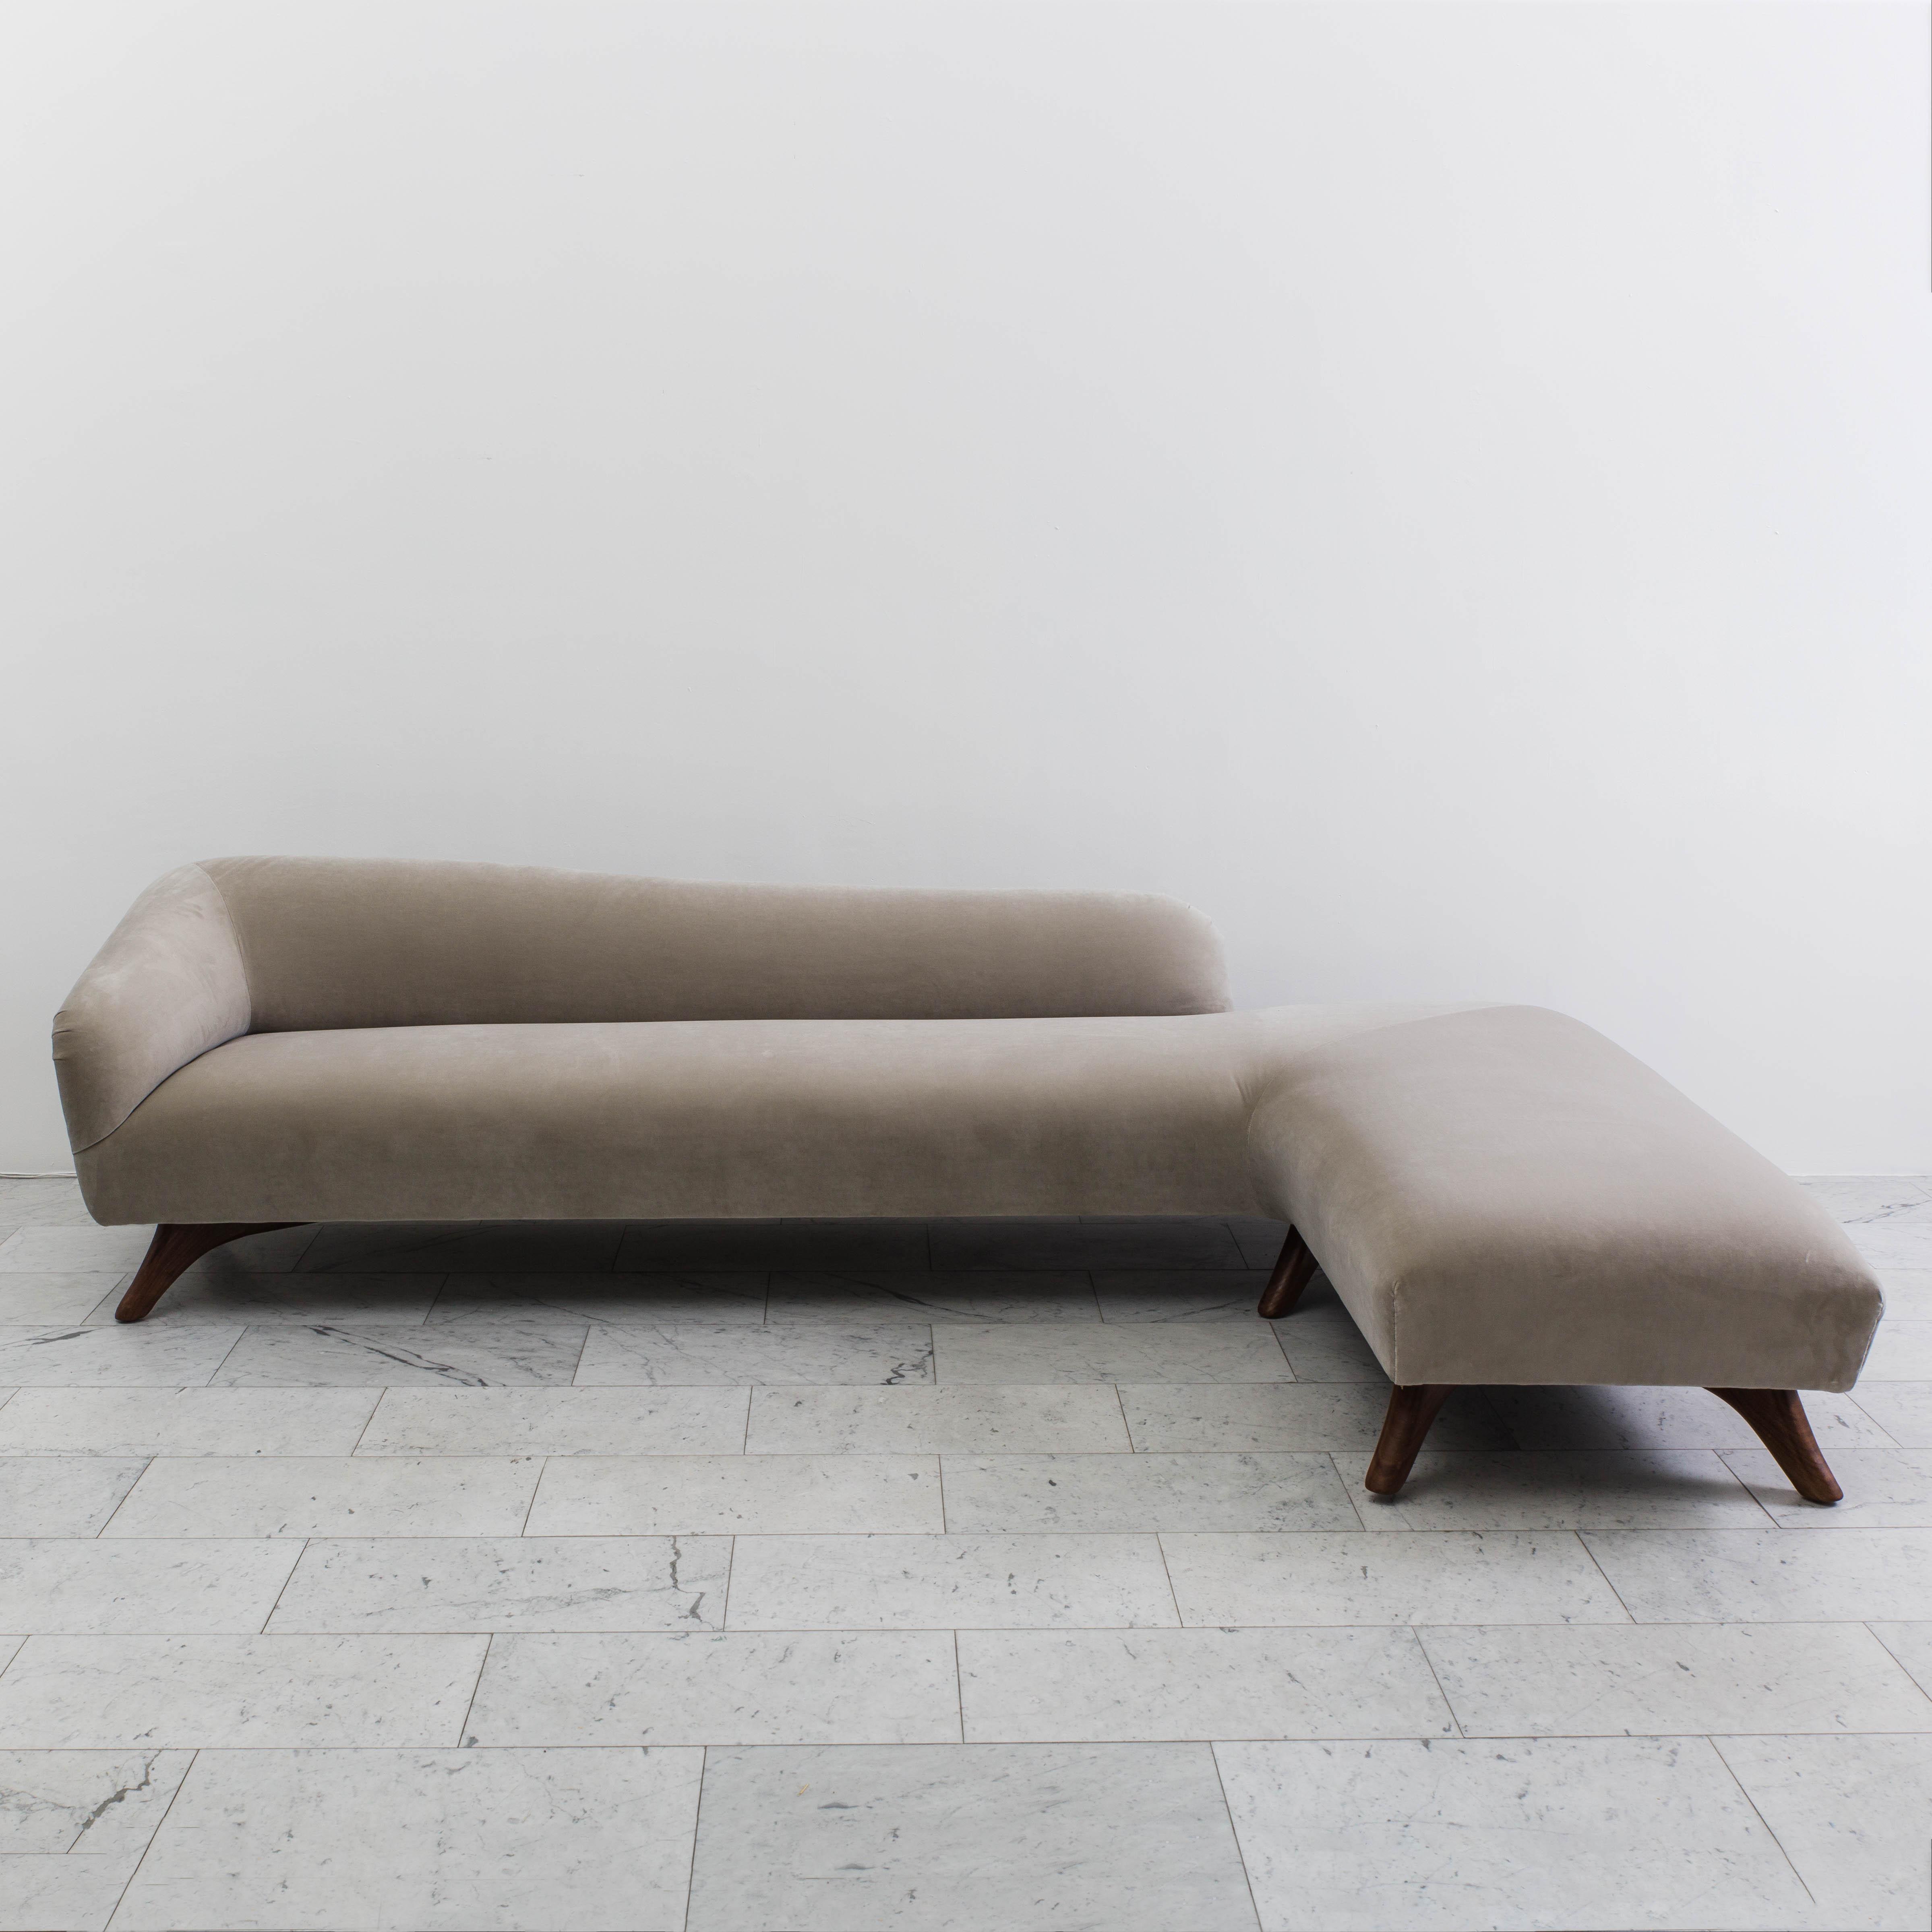 Genial Vladimir Kagan, L Shaped Swan Back Sofa ...